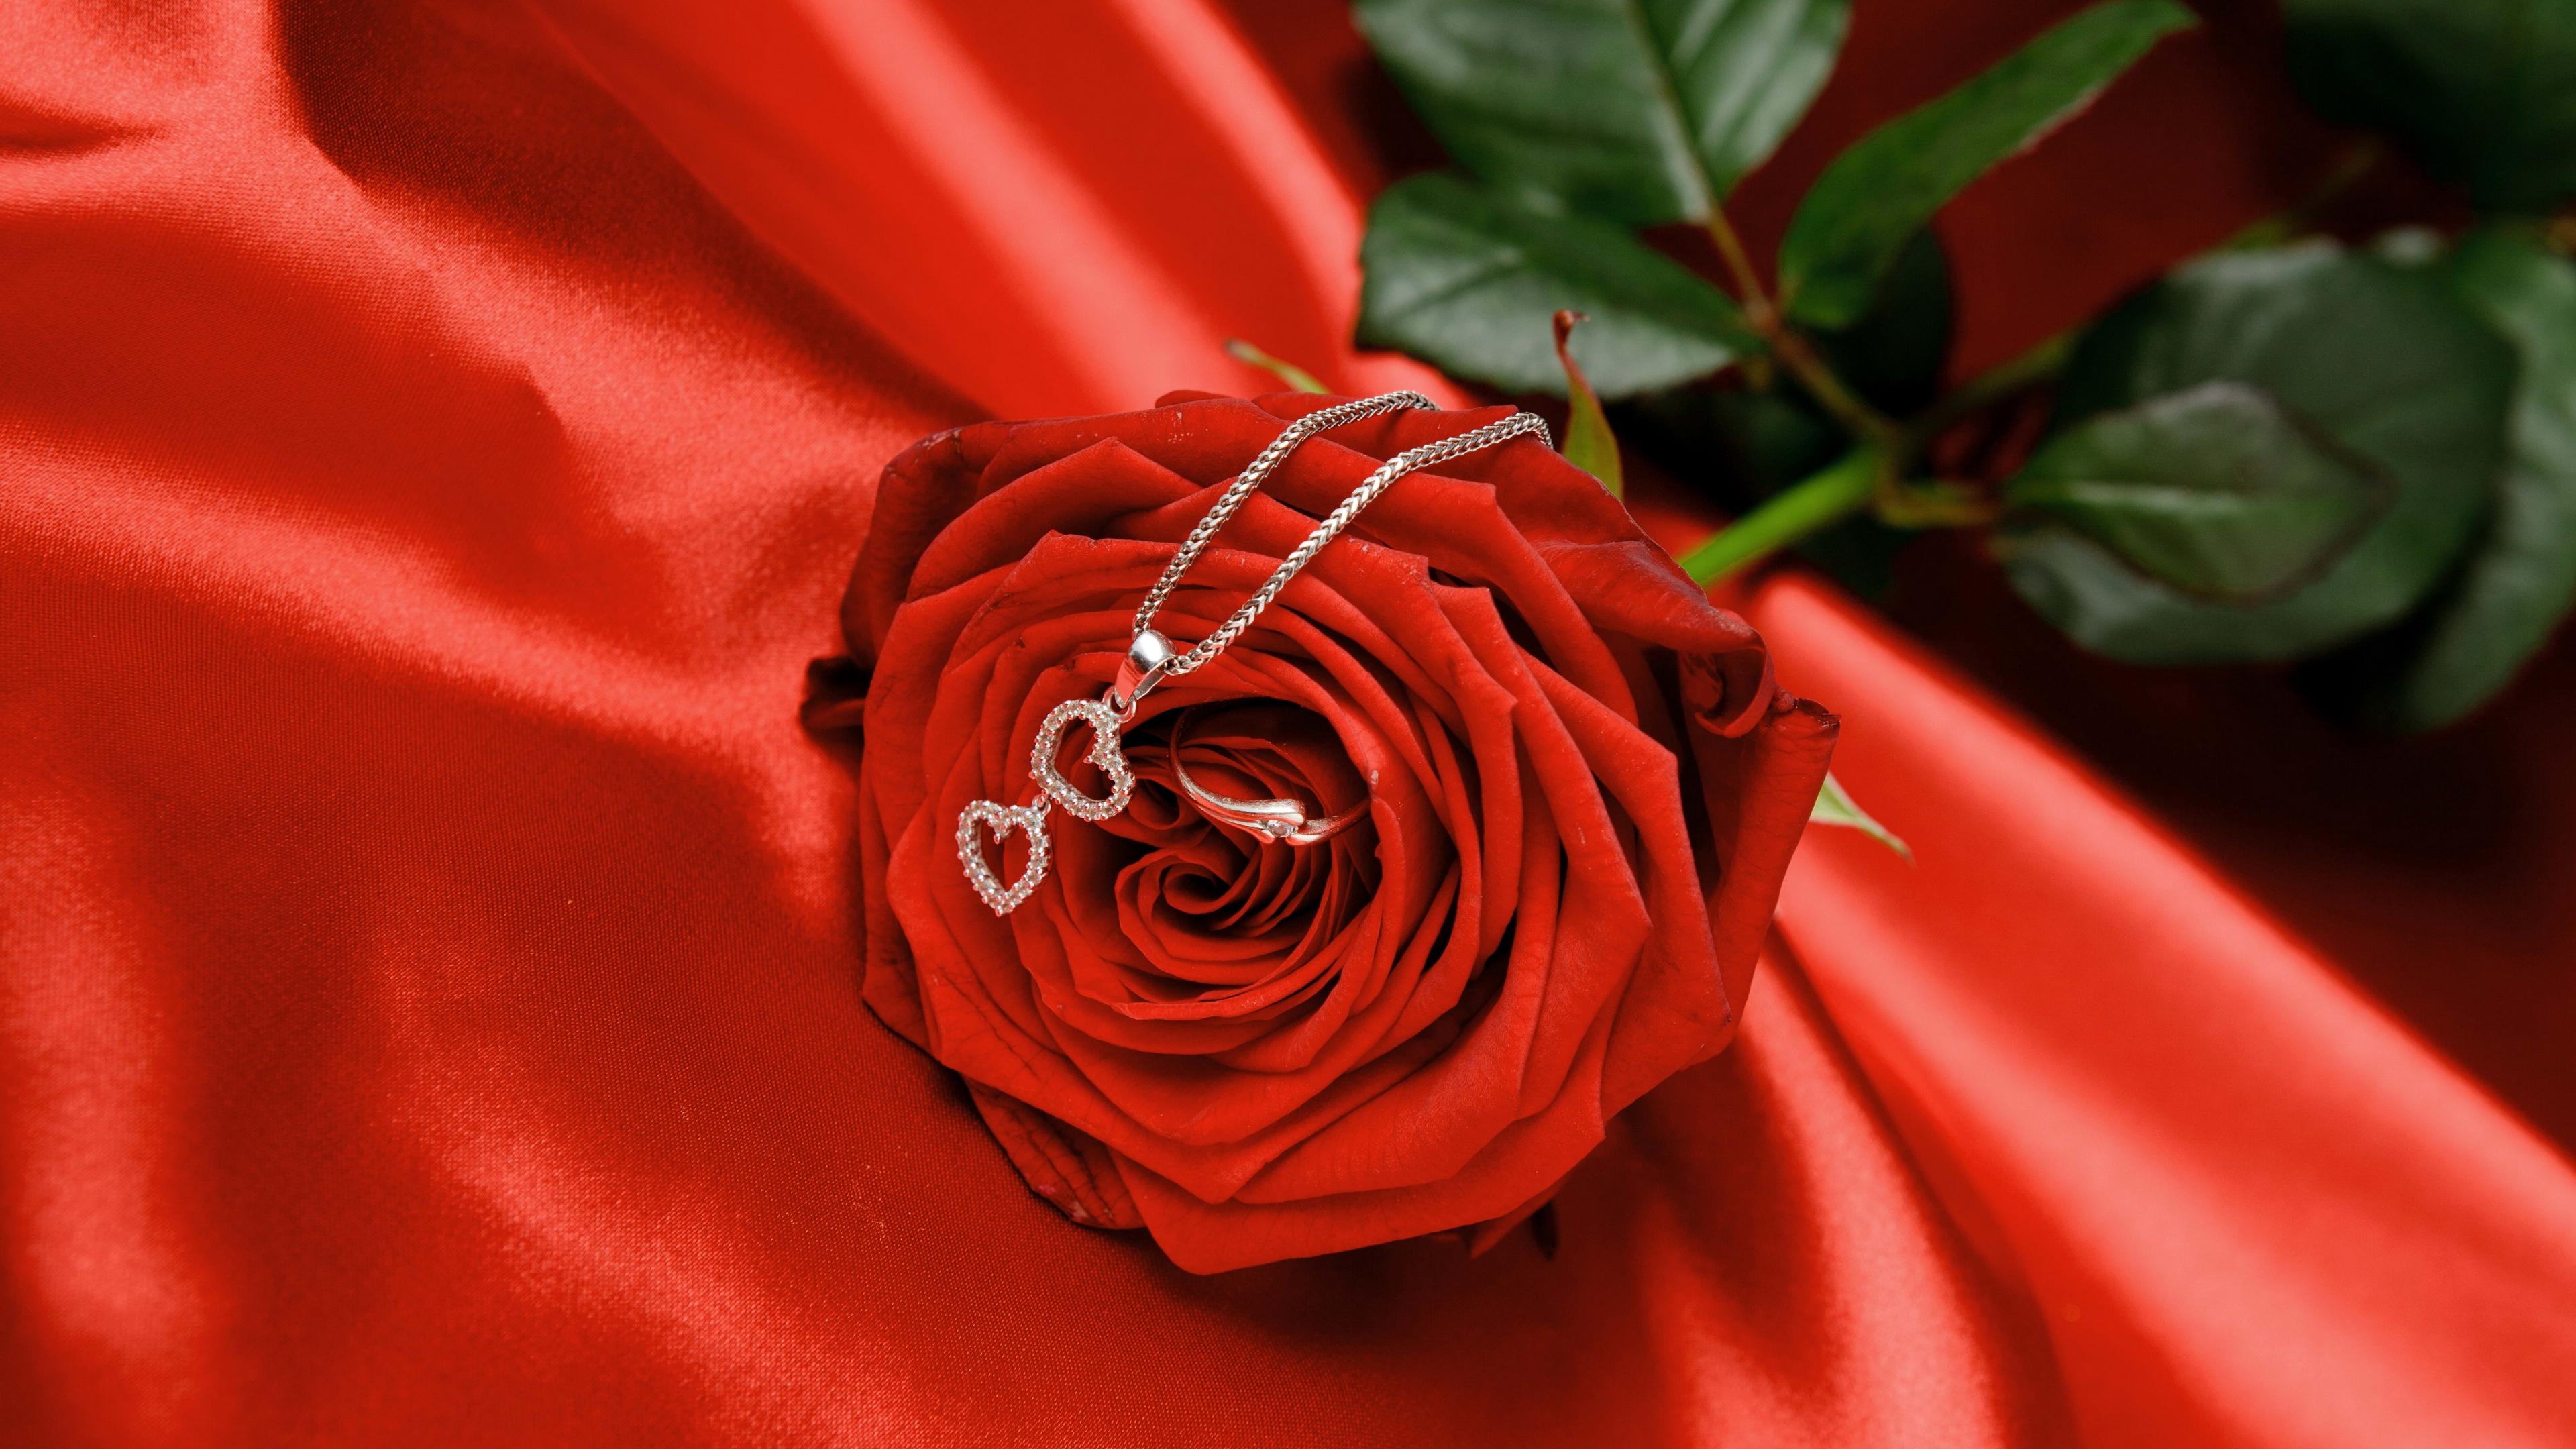 rose chain heart flower 4k 1540065037 - rose, chain, heart, flower 4k - Rose, Heart, chain